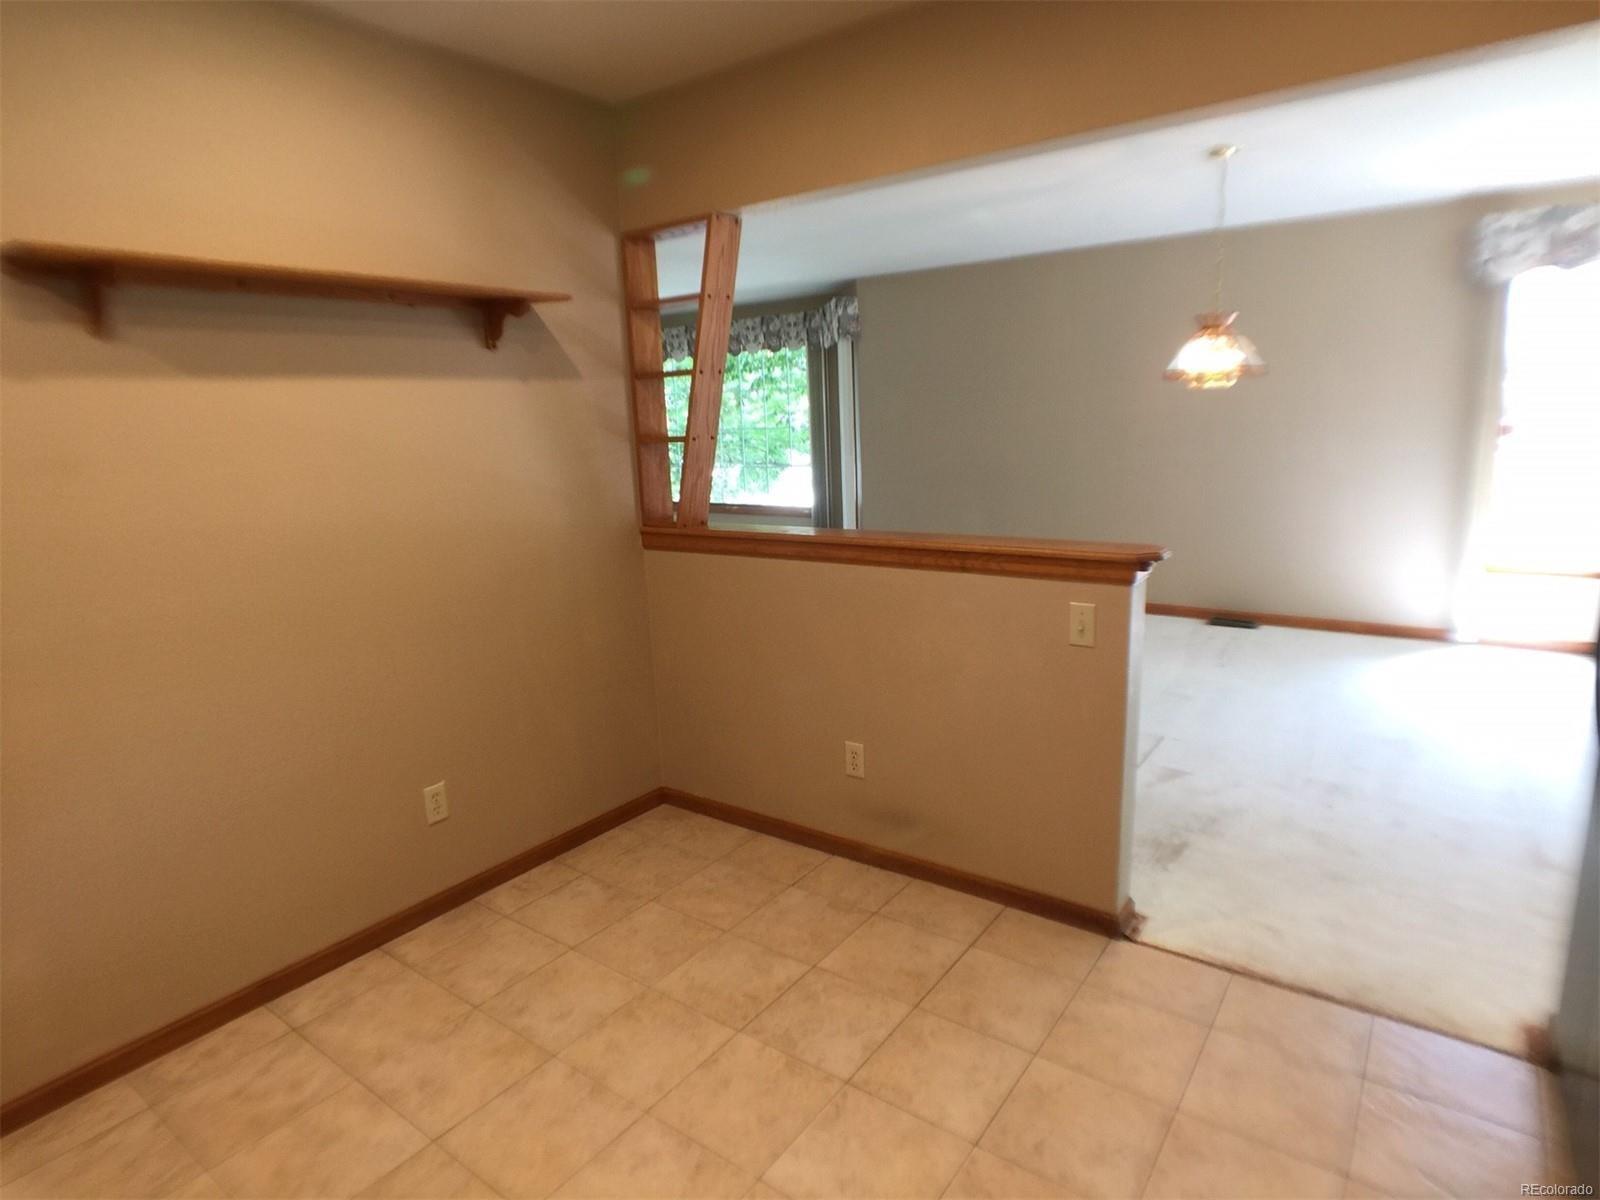 MLS# 8556329 - 1 - 8967  Greenspointe Lane, Highlands Ranch, CO 80130